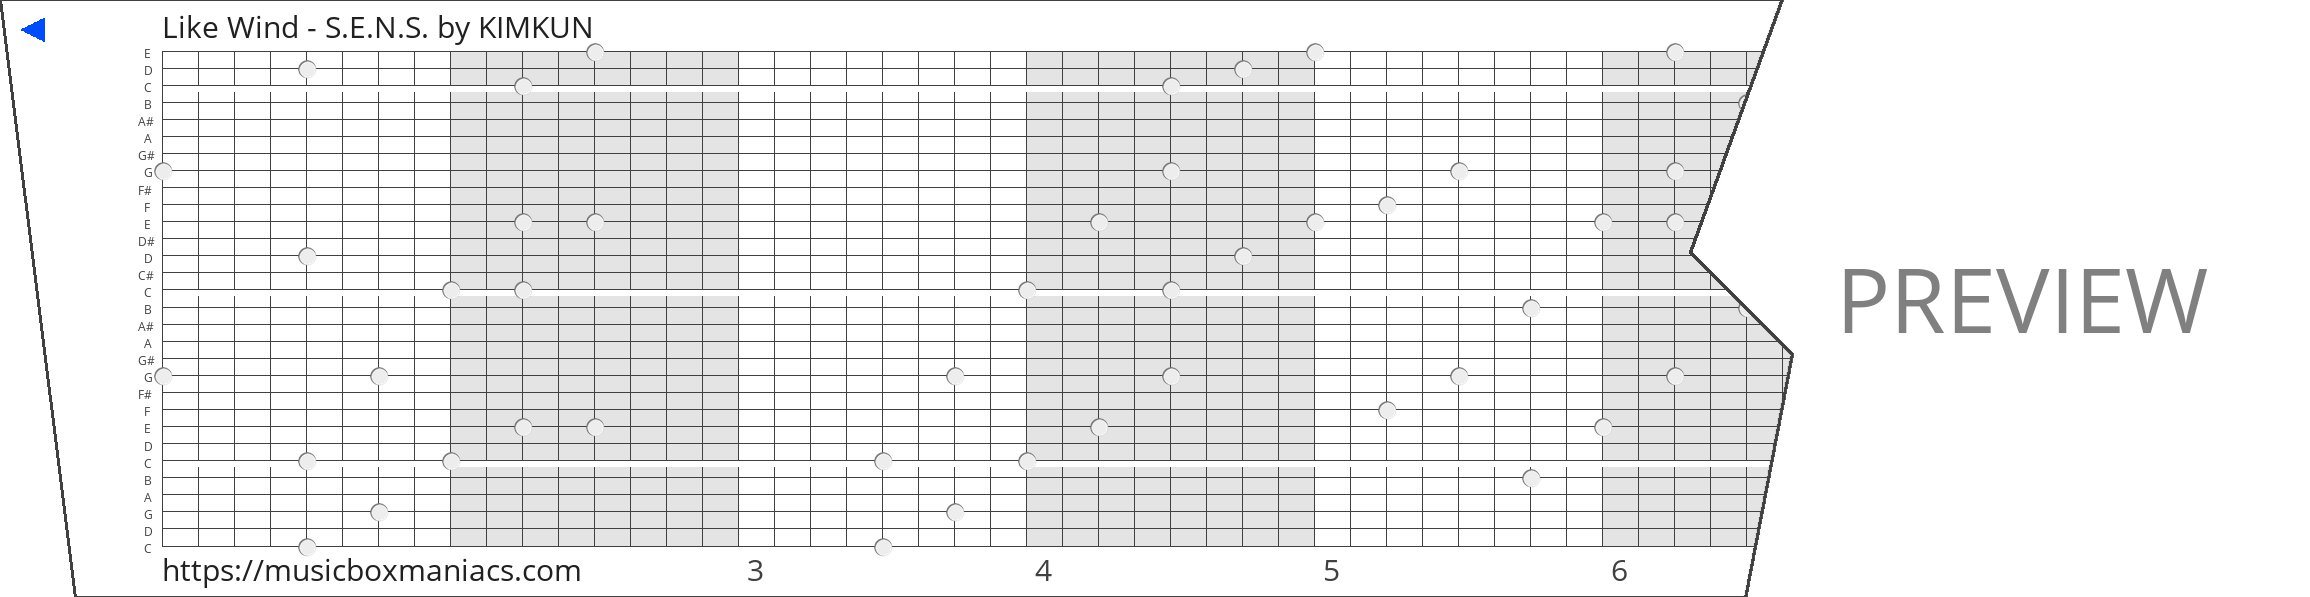 Like Wind - S.E.N.S. 30 note music box paper strip